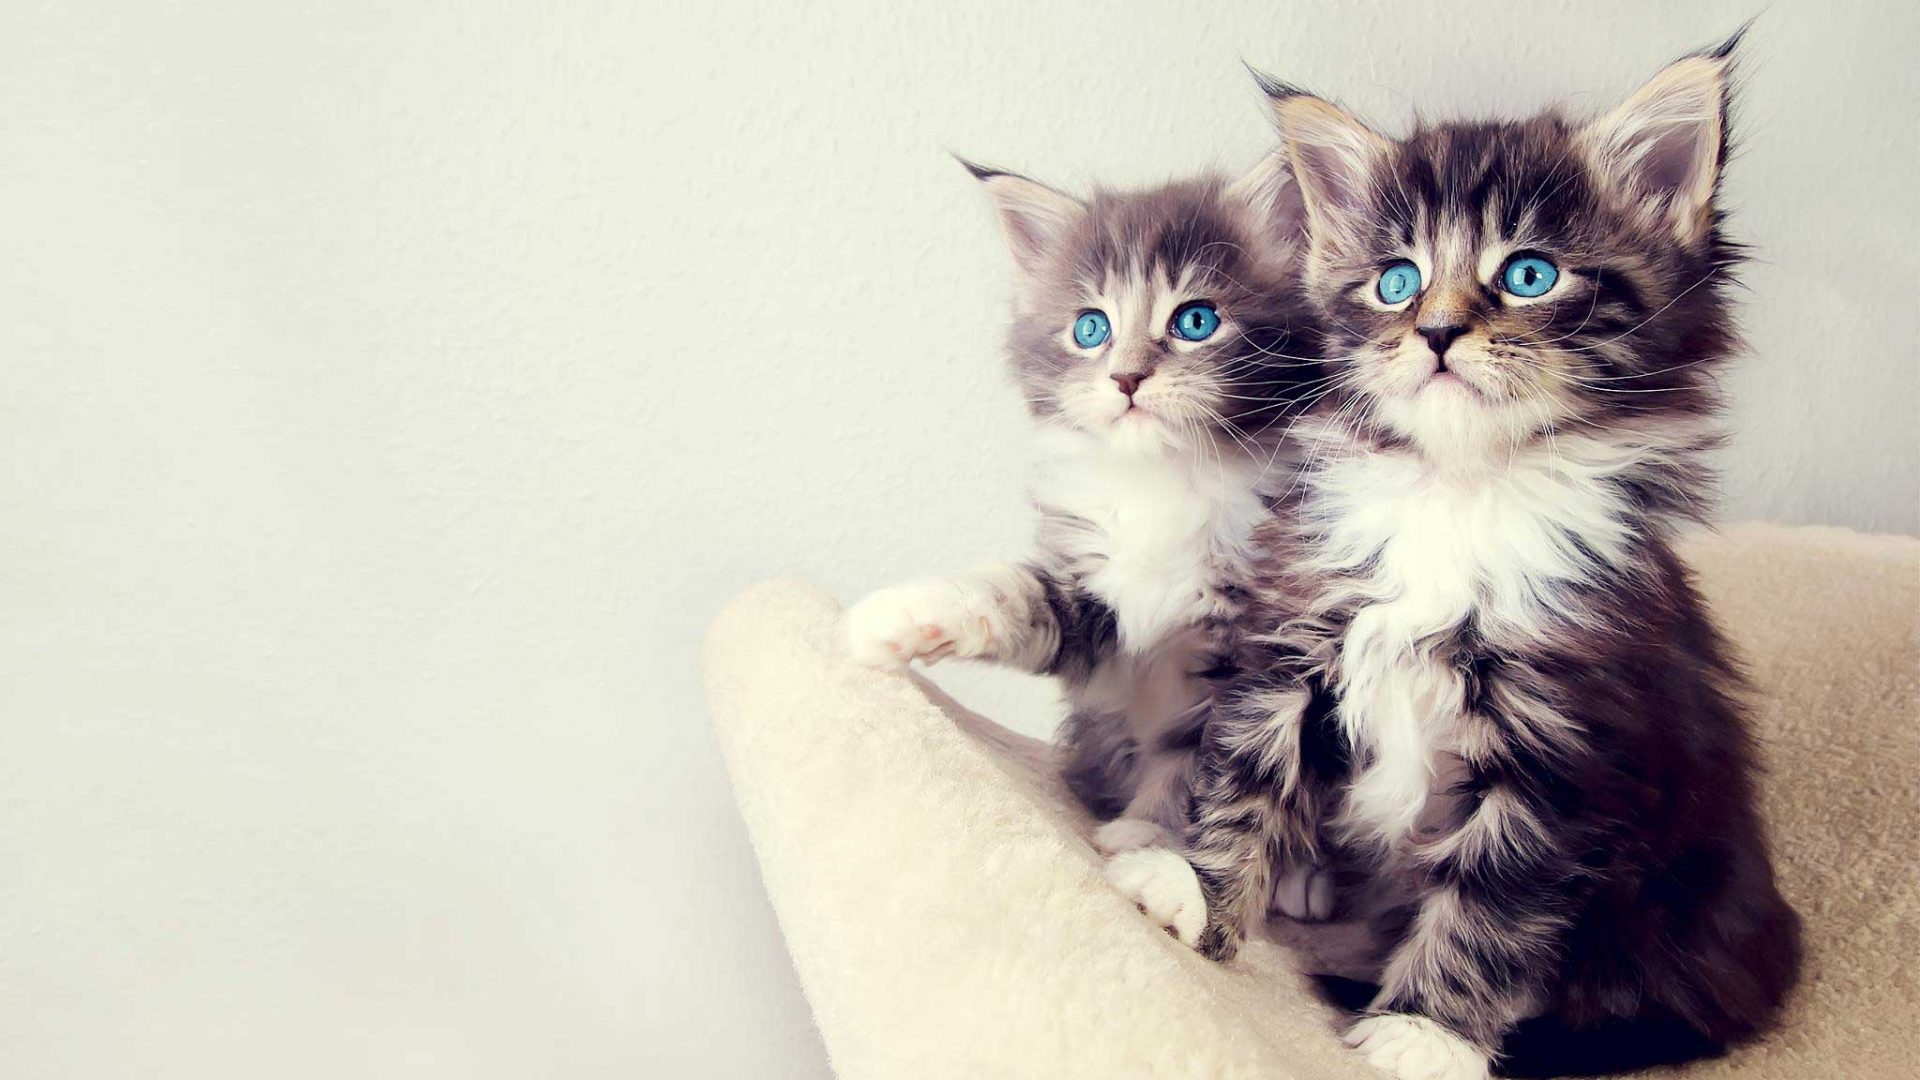 Cute Anime Couple Wallpaper Download Cat Wallpaper Tumblr Pixelstalk Net